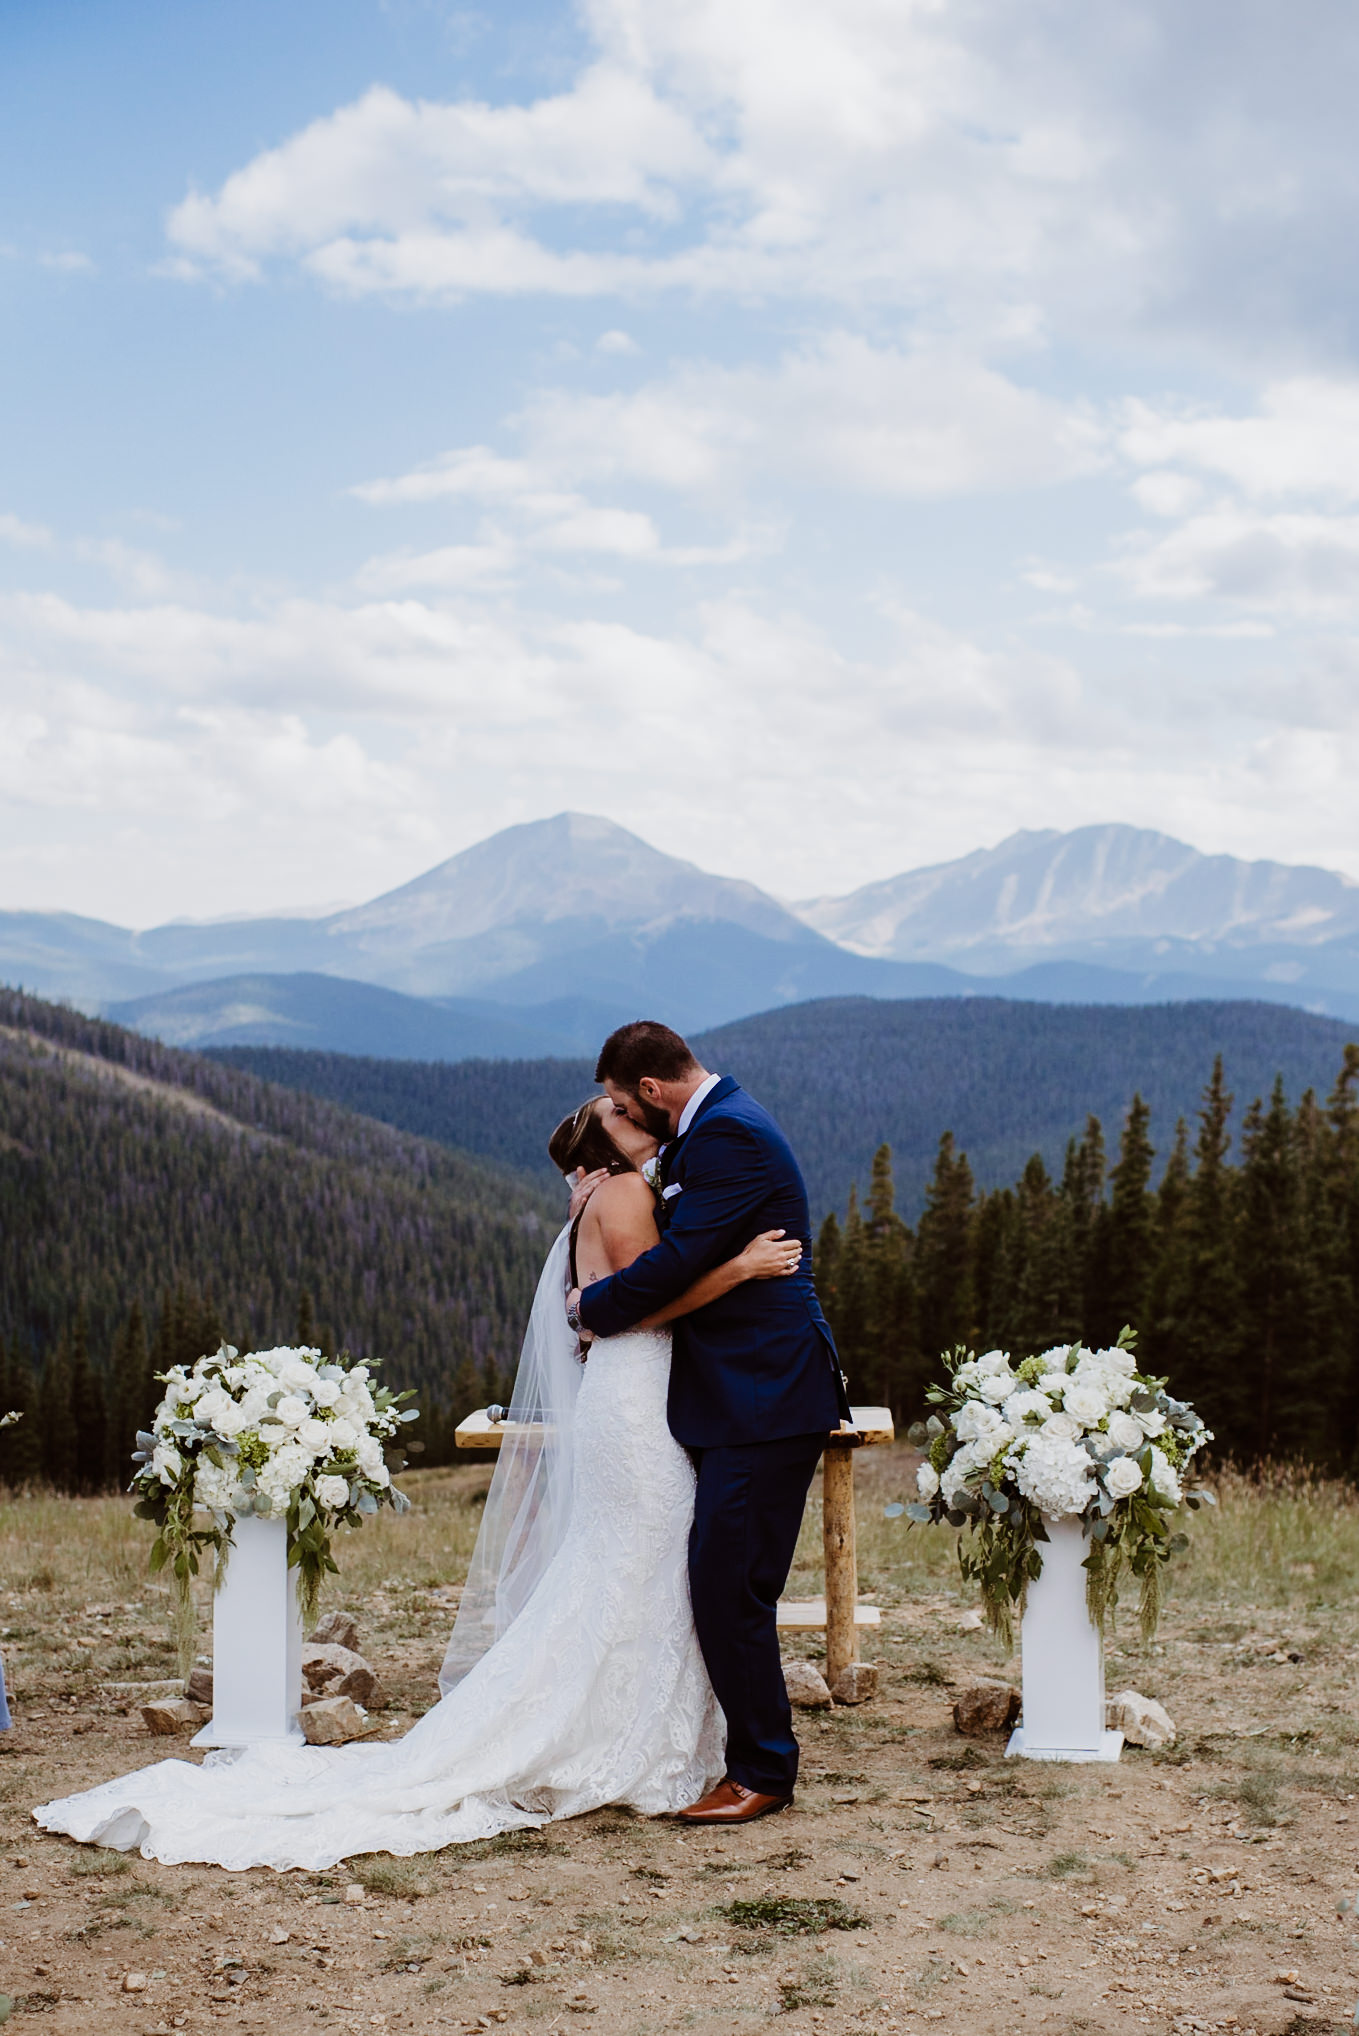 First kiss at TImber Ridge at Keystone, Colorado mountain wedding